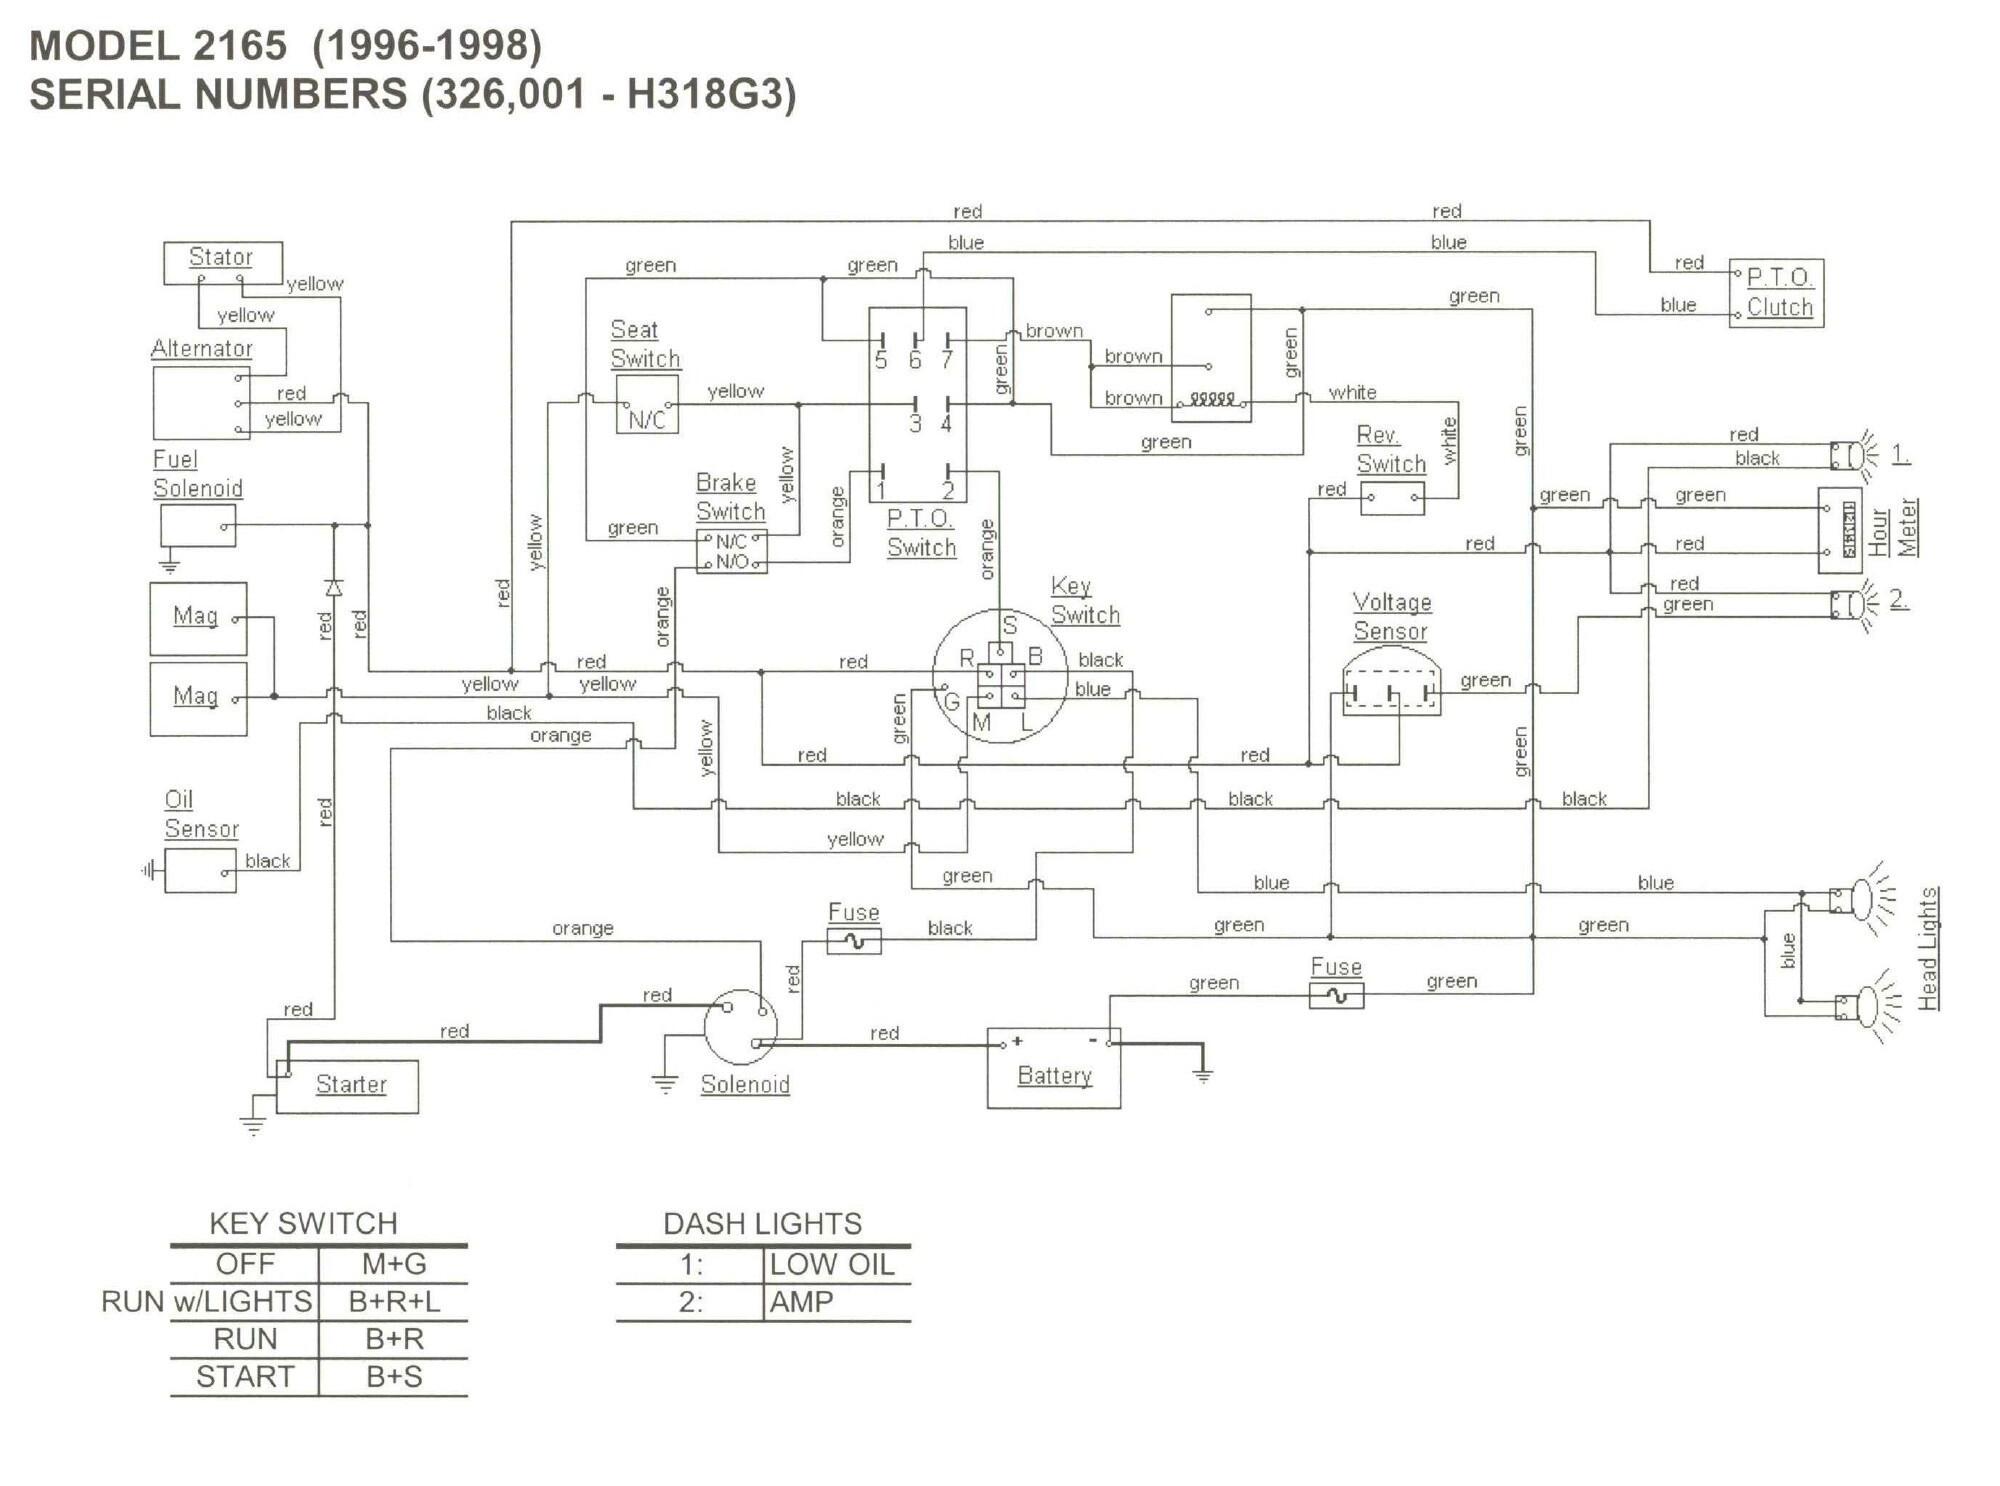 [FPWZ_2684]  EX_7148] Cub Cadet Wiring Diagrams Wiring Diagrams Schematic Wiring | Cub Cadet 2135 Wiring Diagram |  | Wned Venet Mohammedshrine Librar Wiring 101